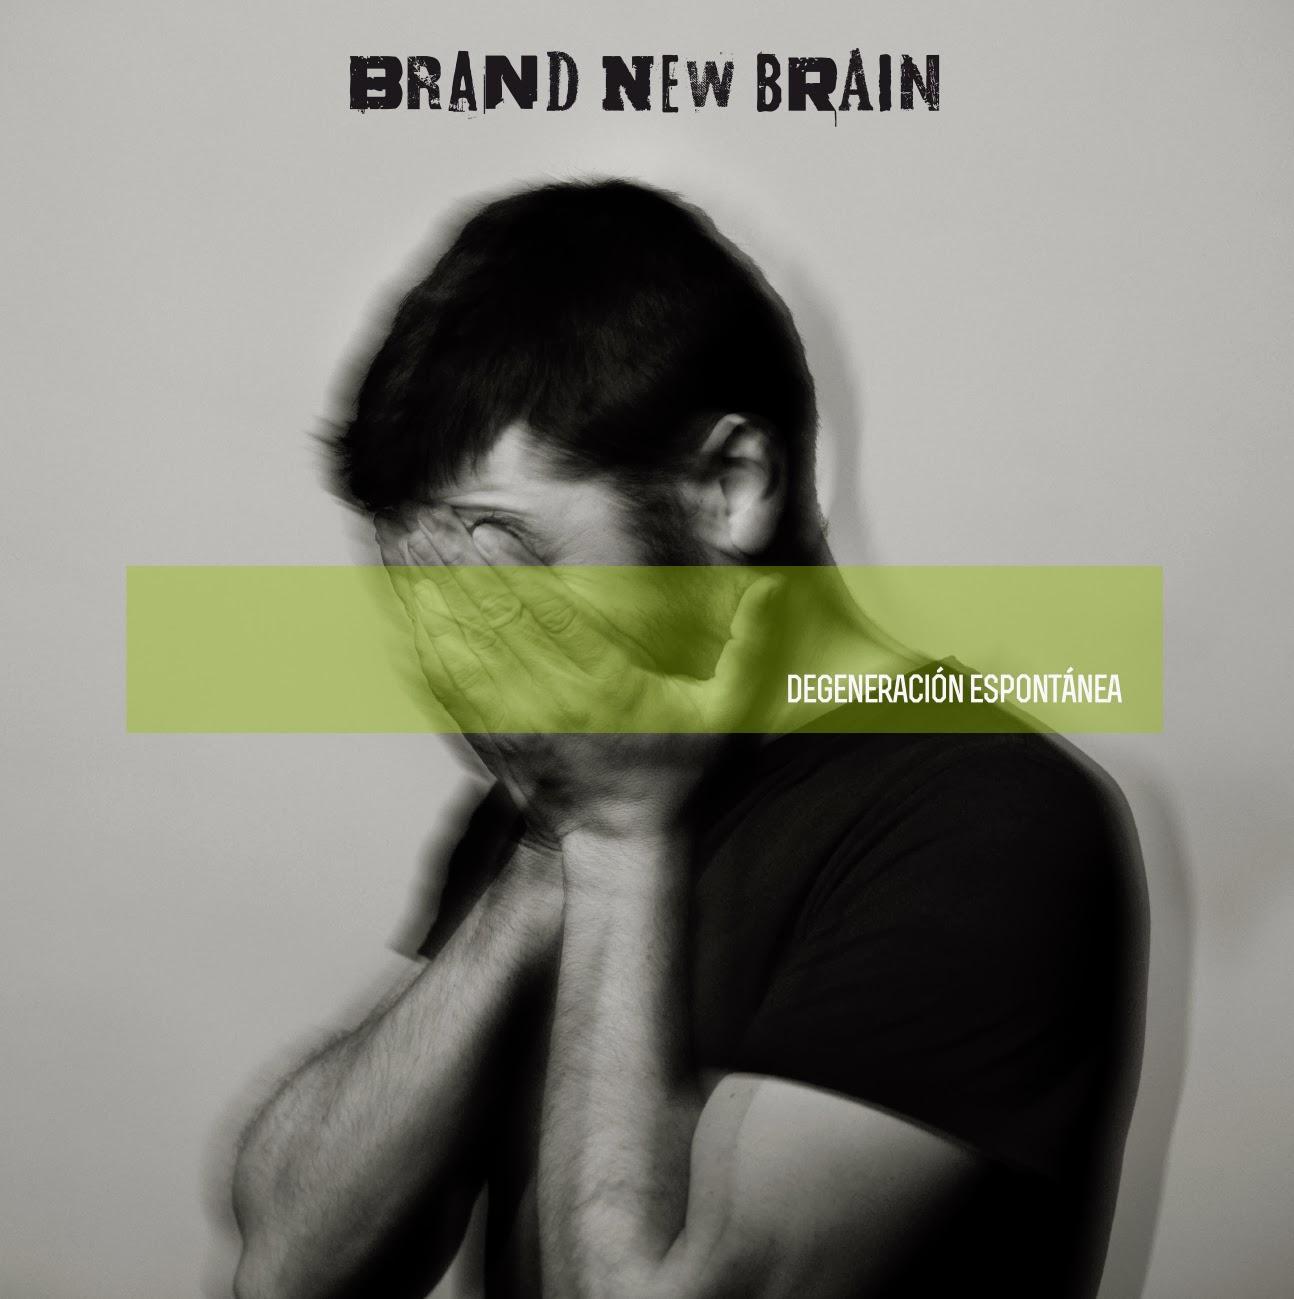 Brand New Brain DEGENERACIÓN ESPONTÁNEA